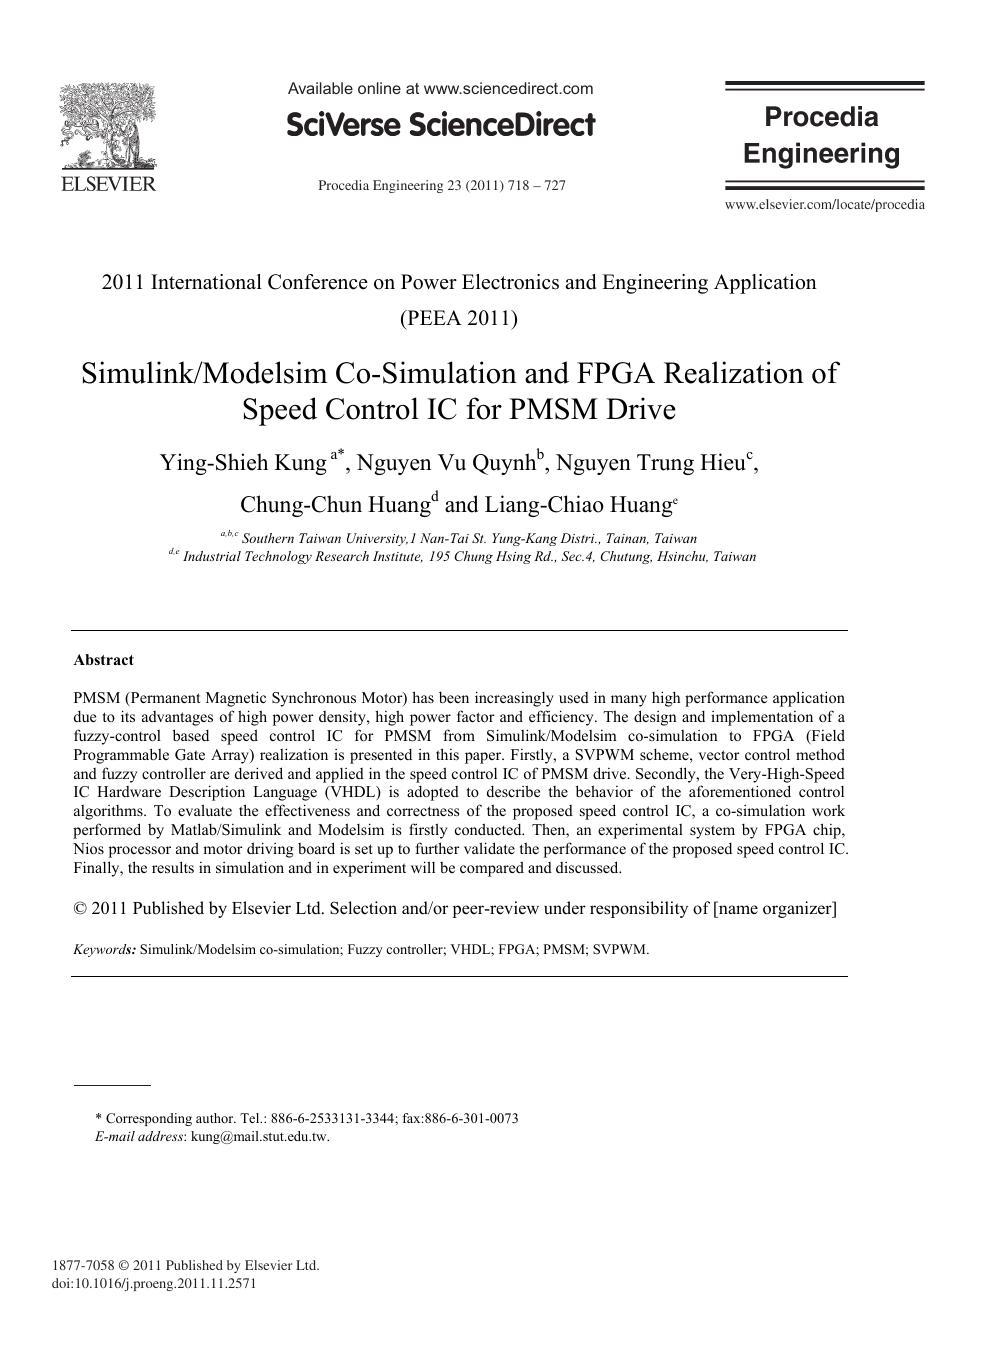 Simulink/Modelsim Co-Simulation and FPGA Realization of